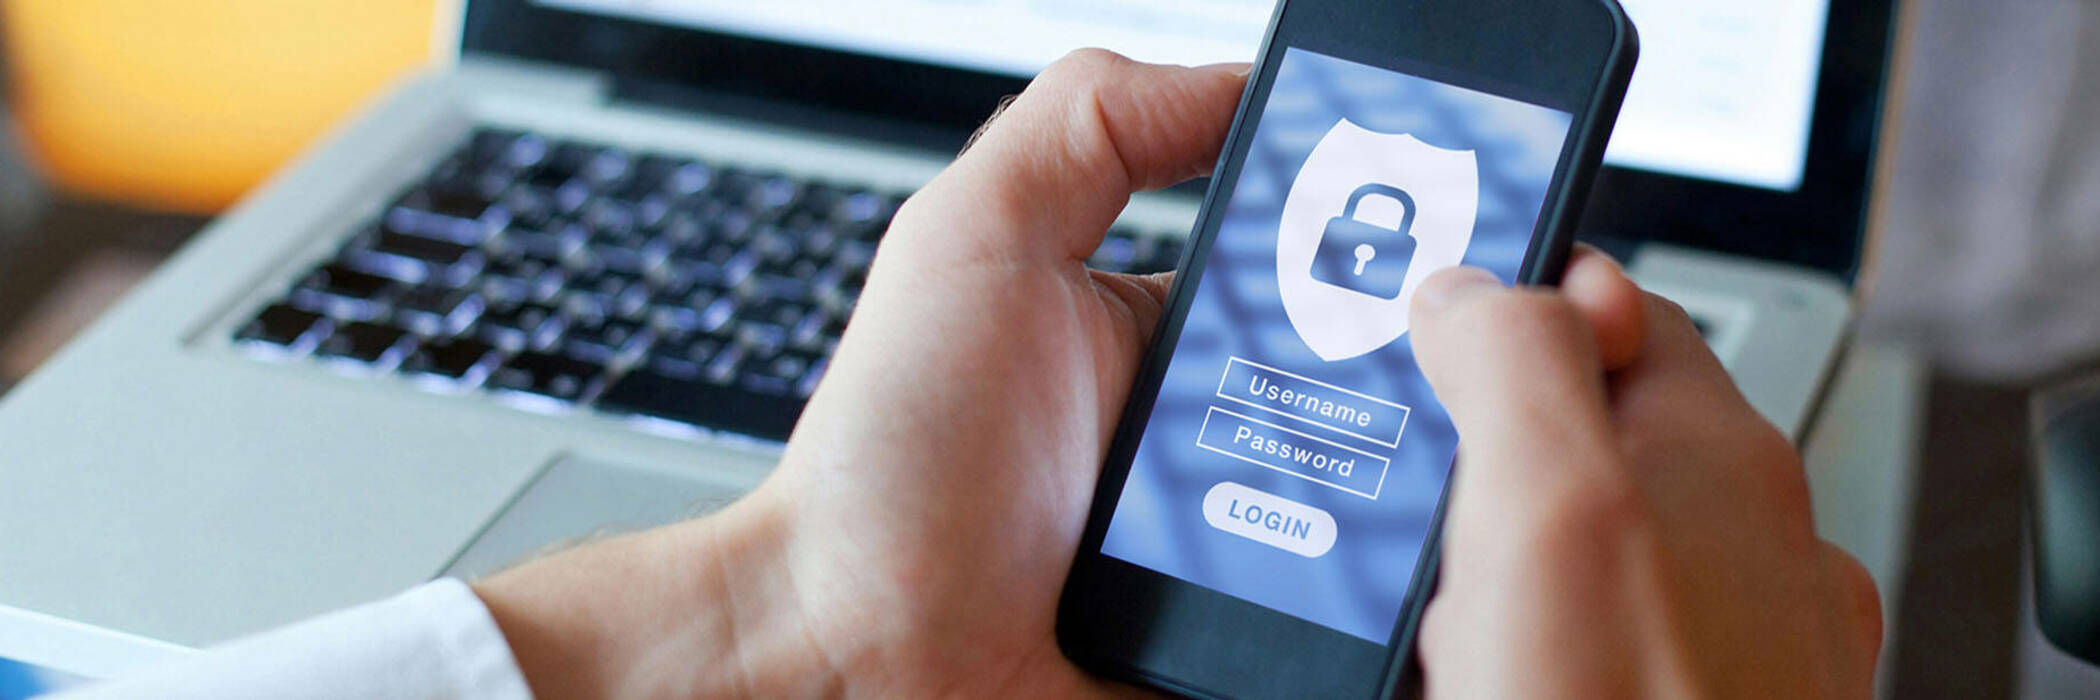 Phone security password